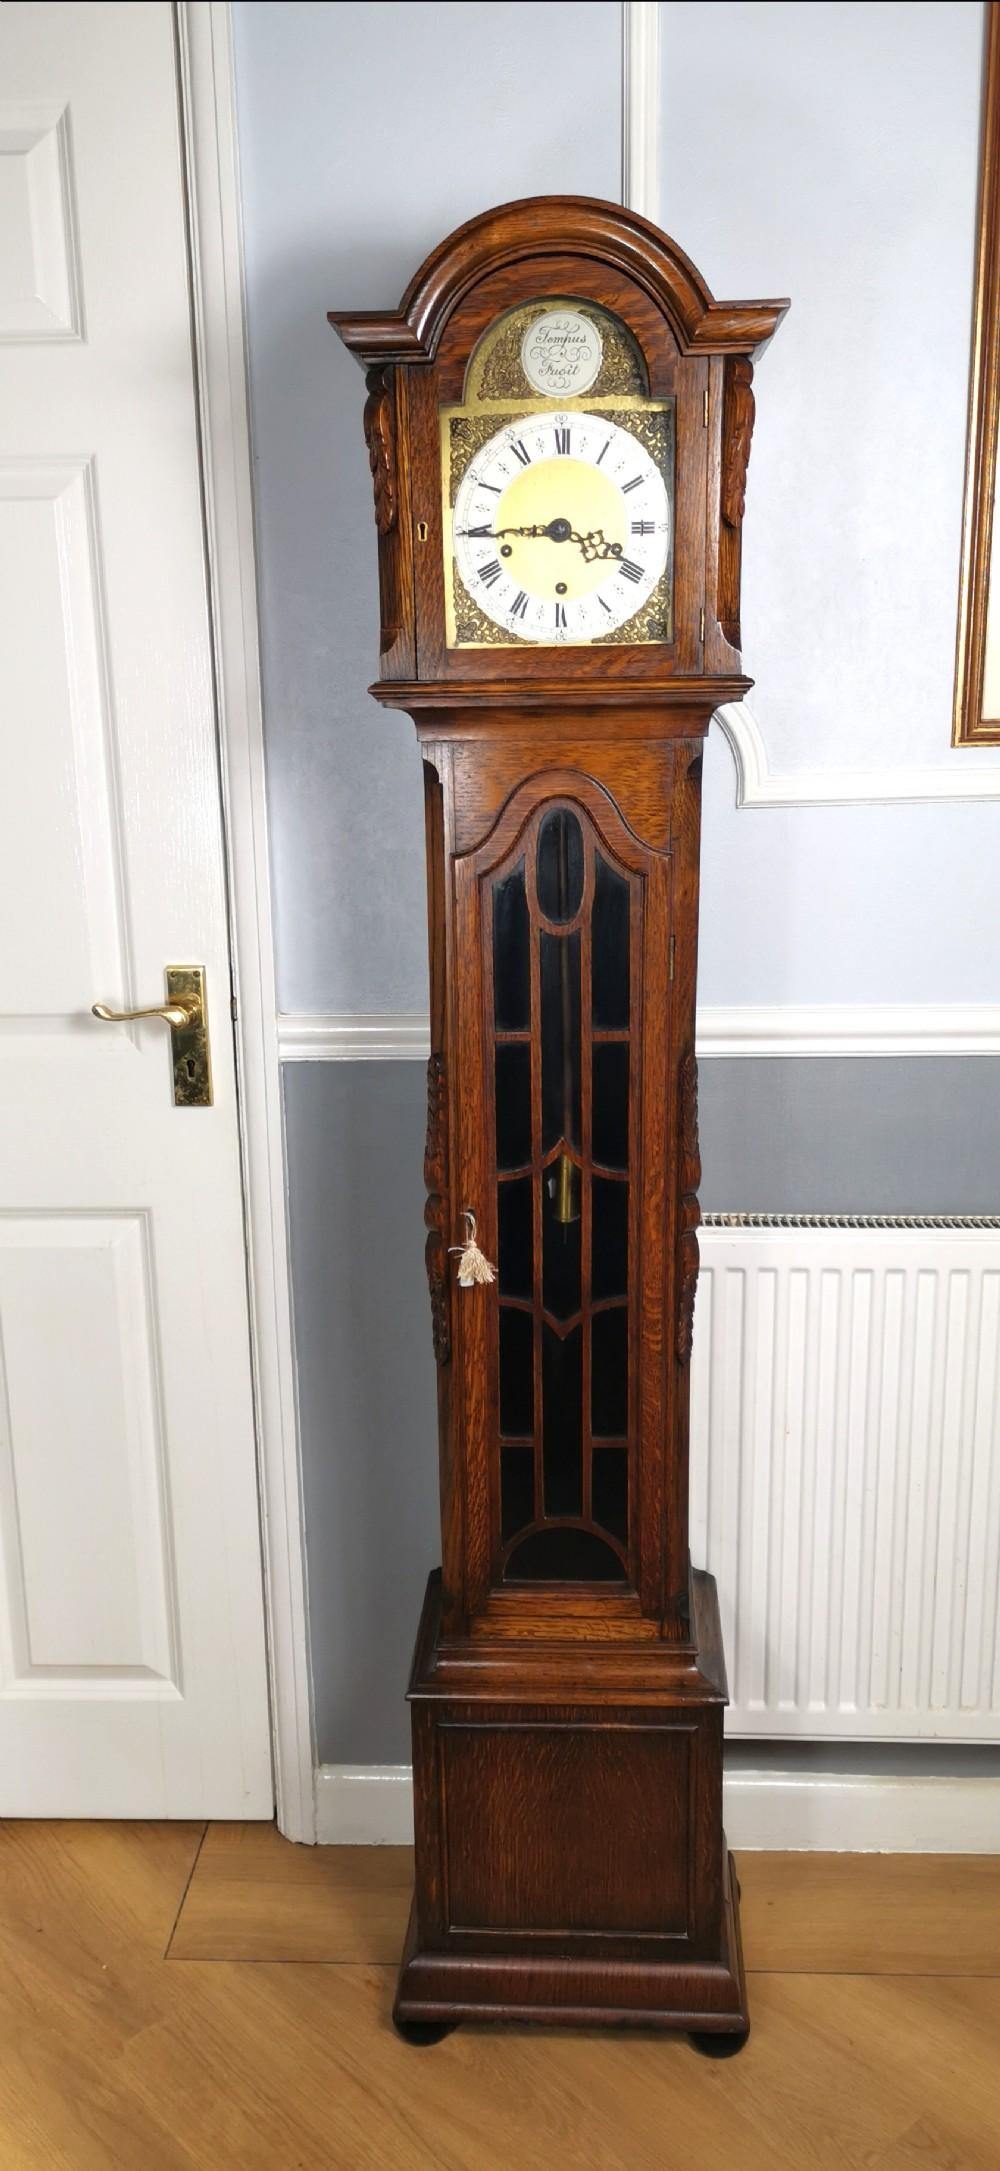 quarter chiming hour striking english dwarf grandfather or grandmother musical longcase clock of good warm oak astagal glazed trunk door on bun feet